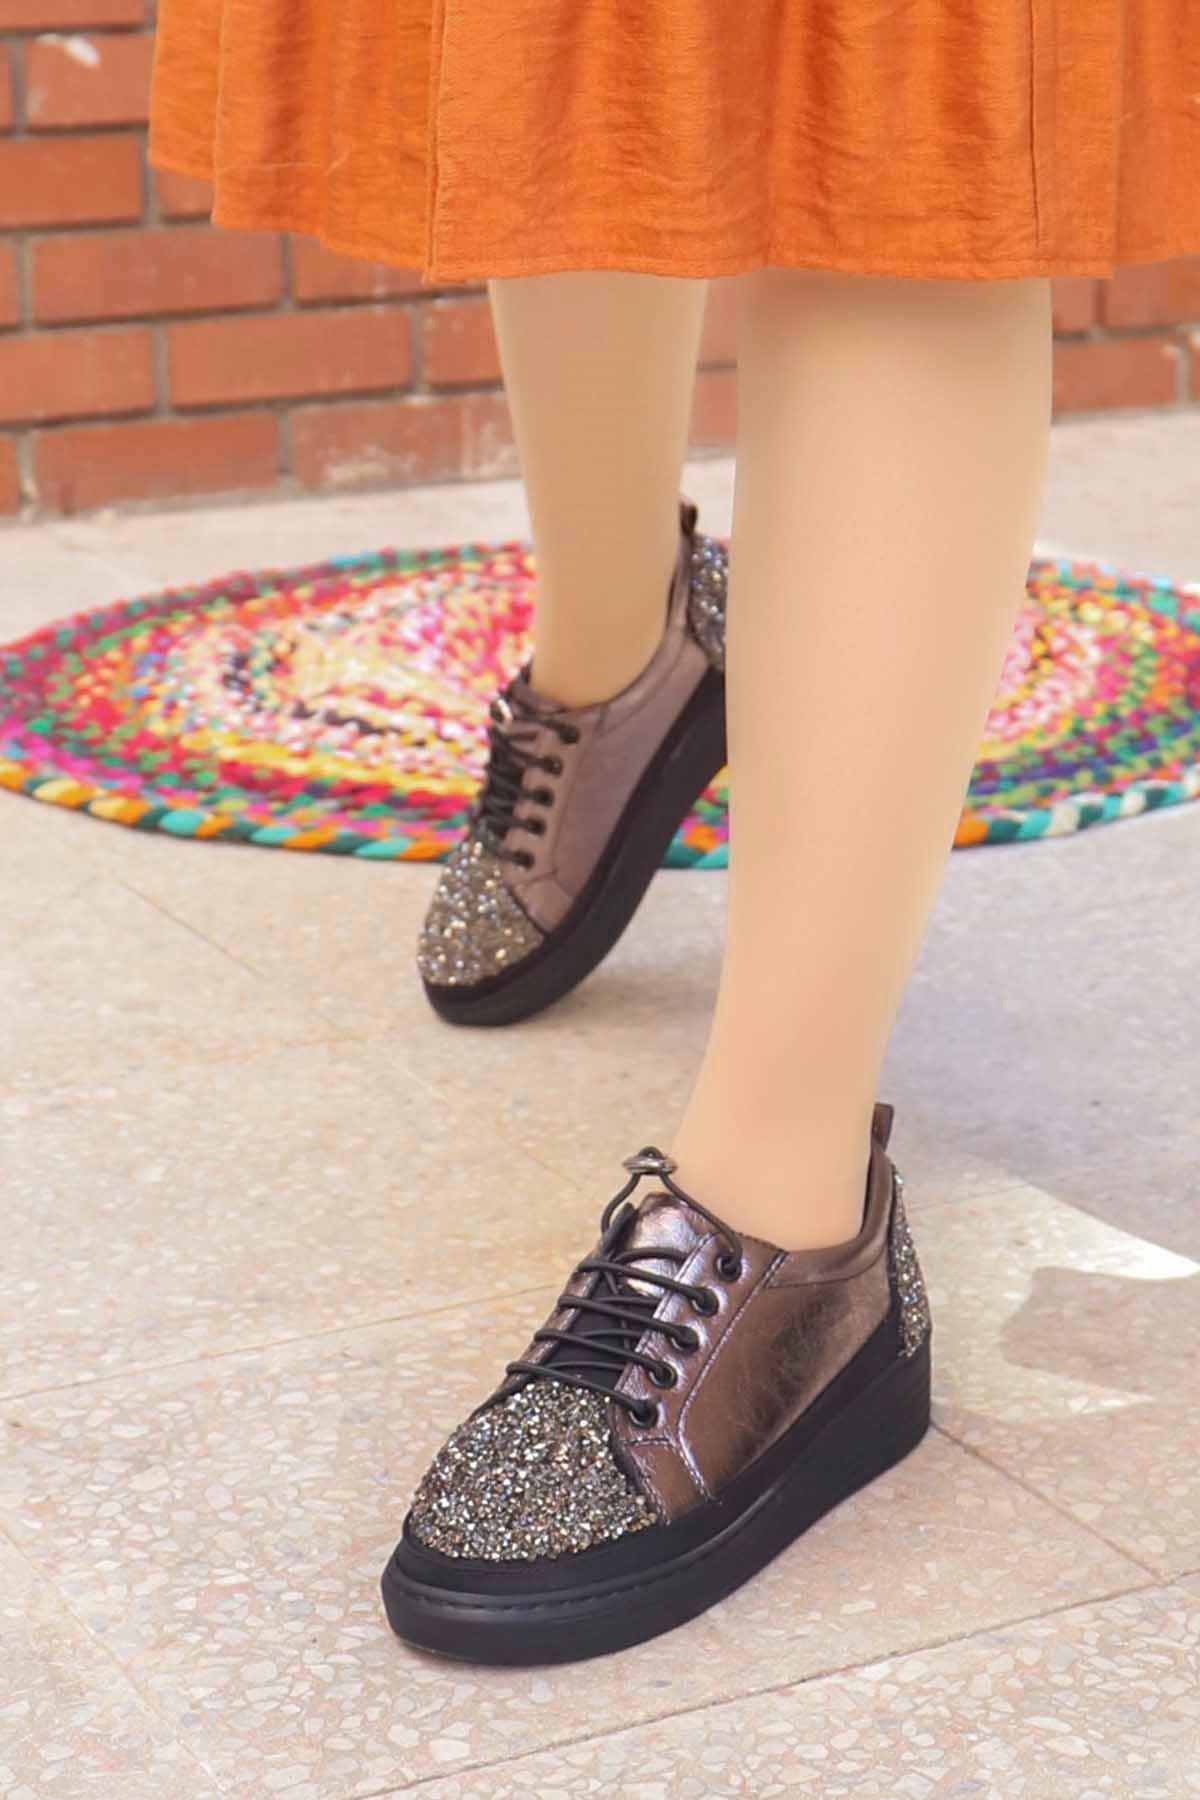 mami-077 Taş Detay Spor Ayakkabı Platin Deri